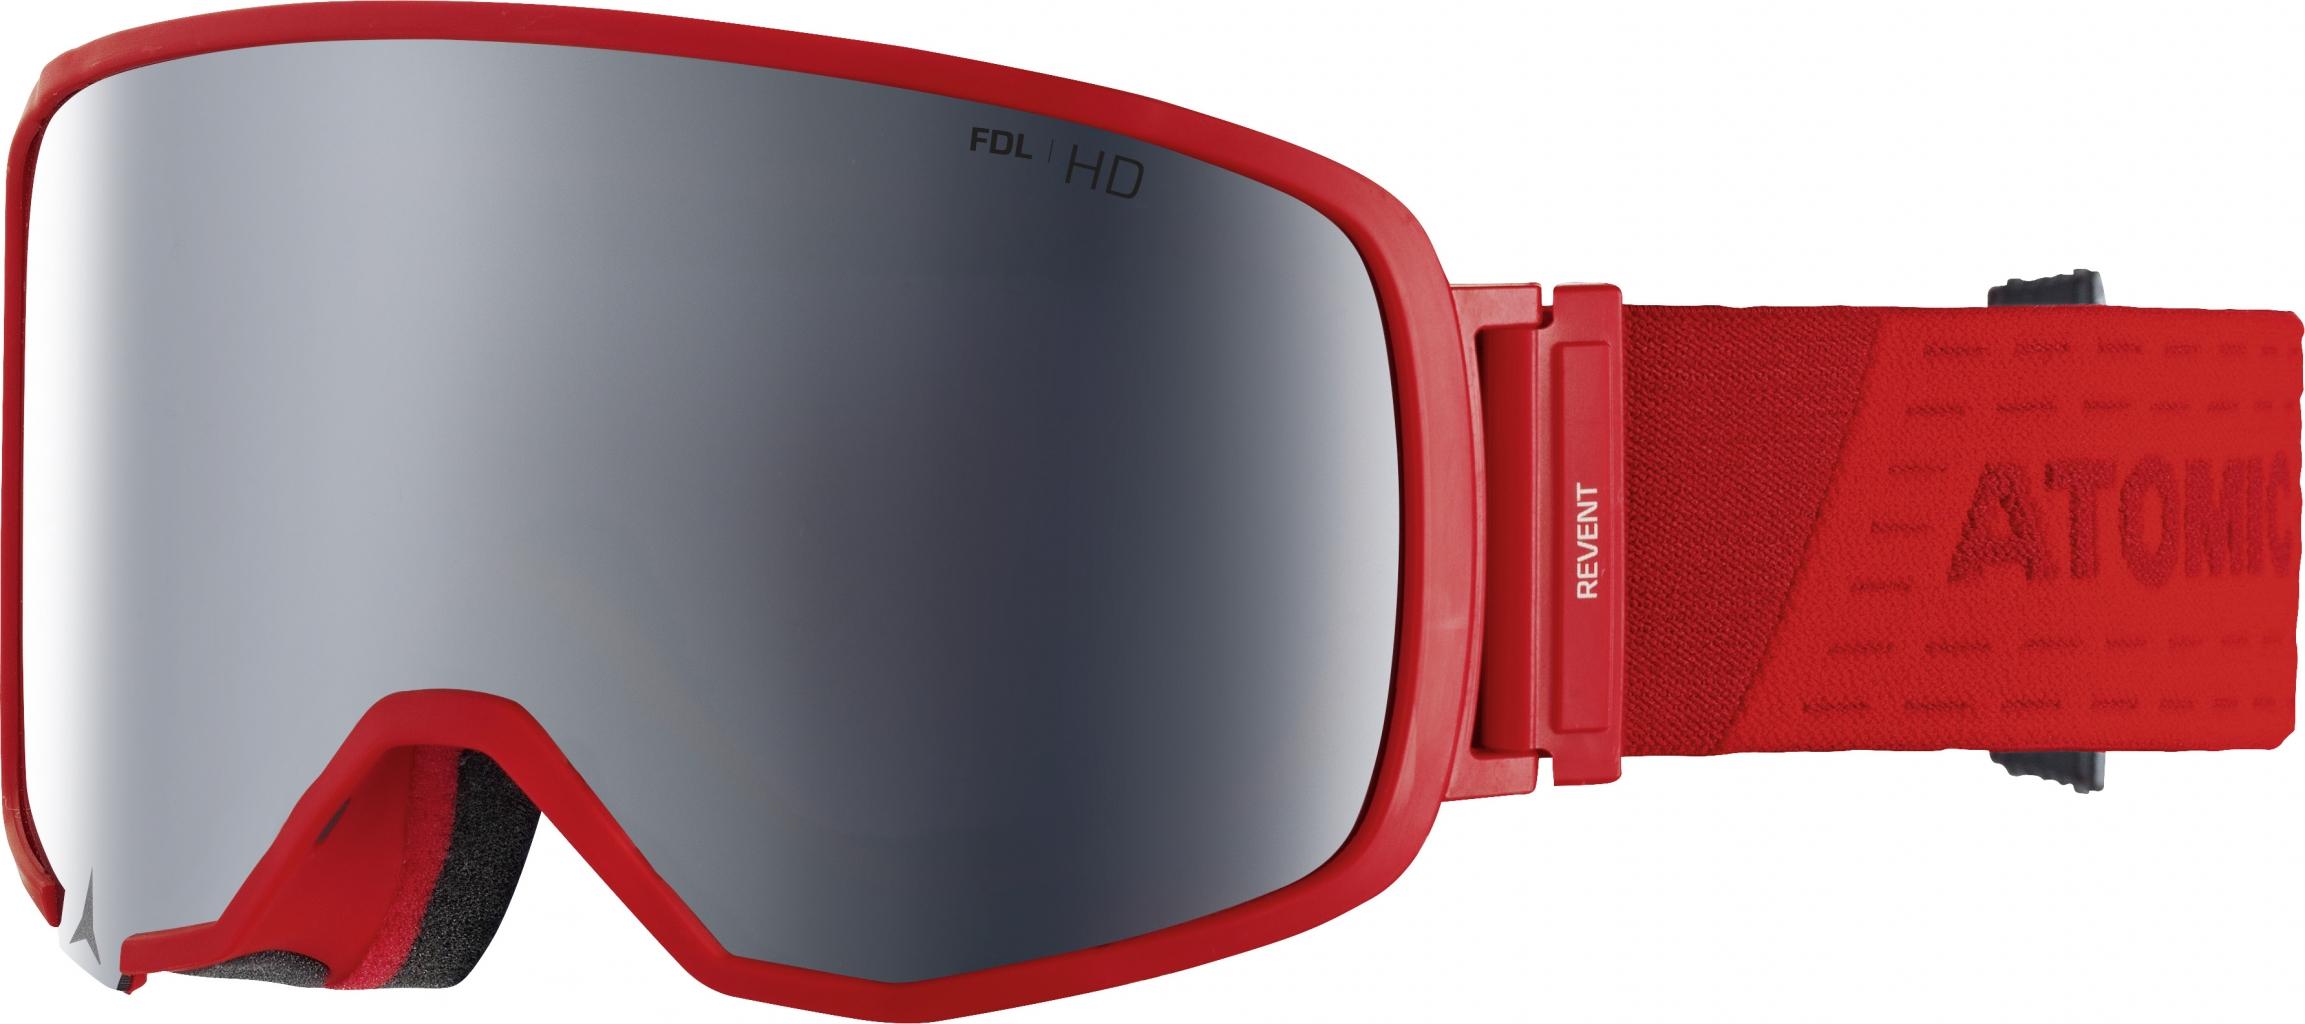 ATOMIC REVENT L FDL HD red 18/19